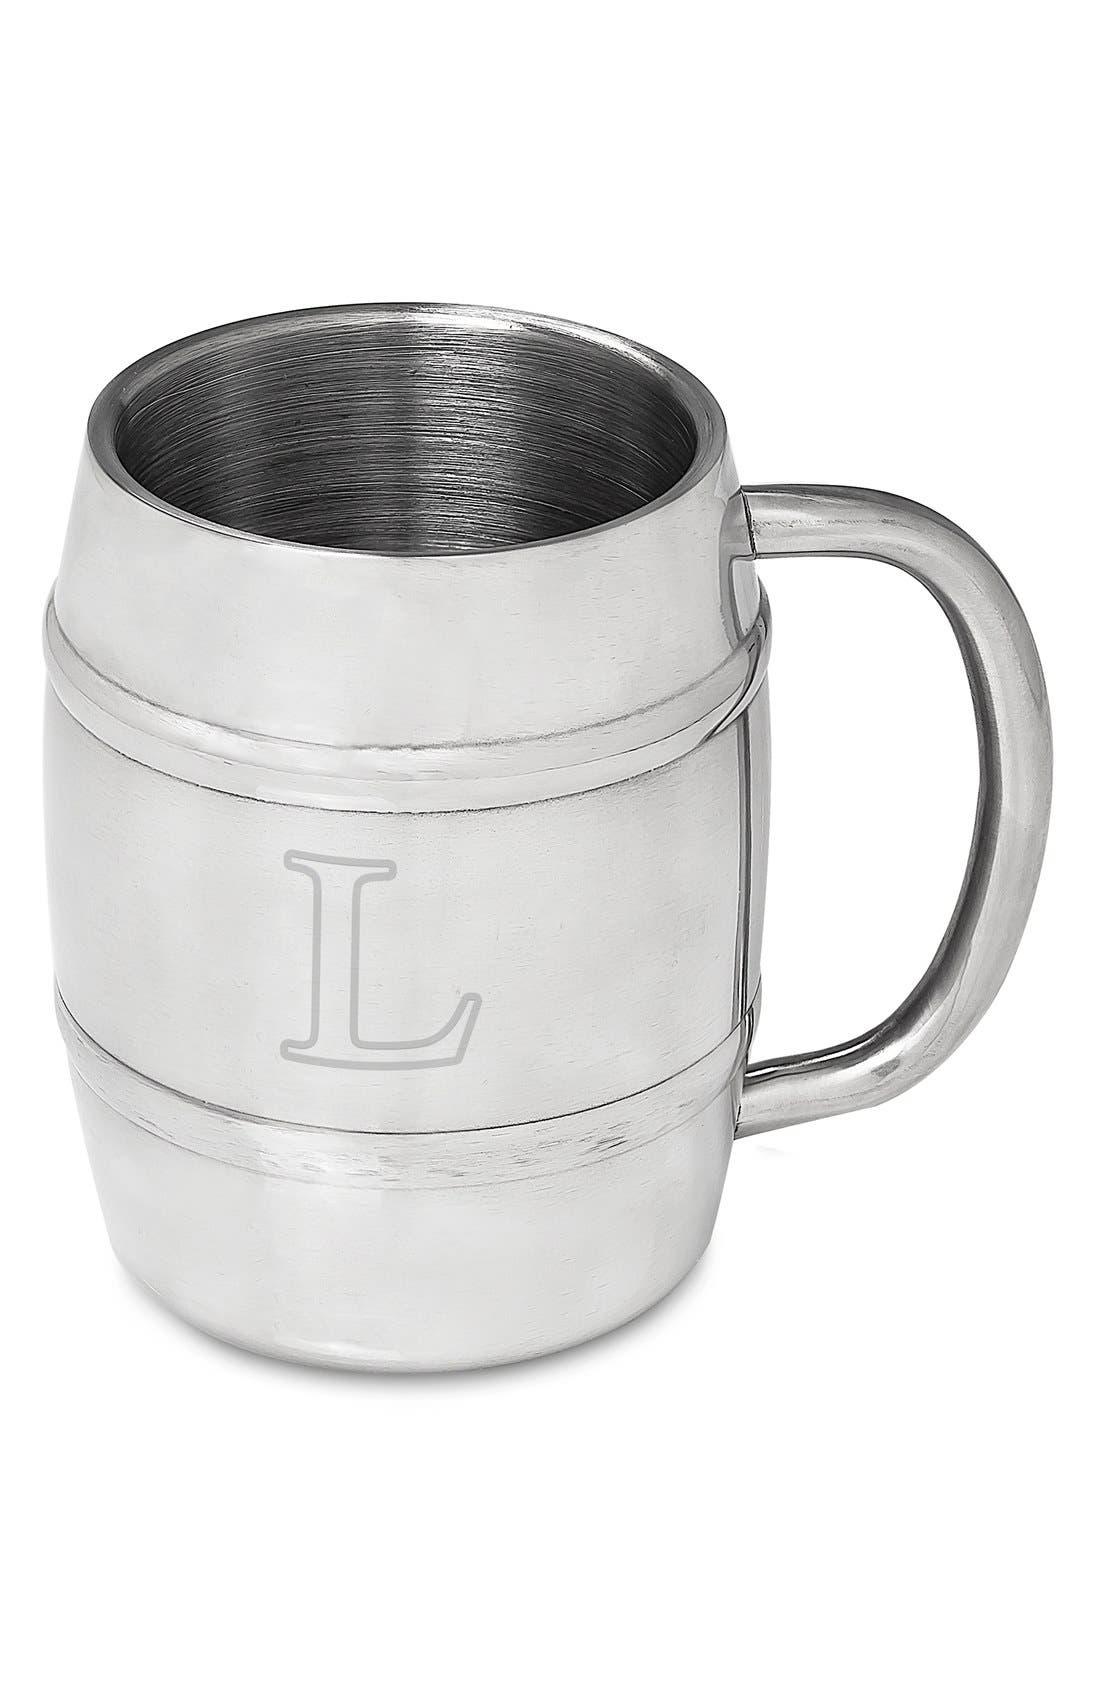 Monogram Stainless Steel Keg Mug,                             Main thumbnail 14, color,